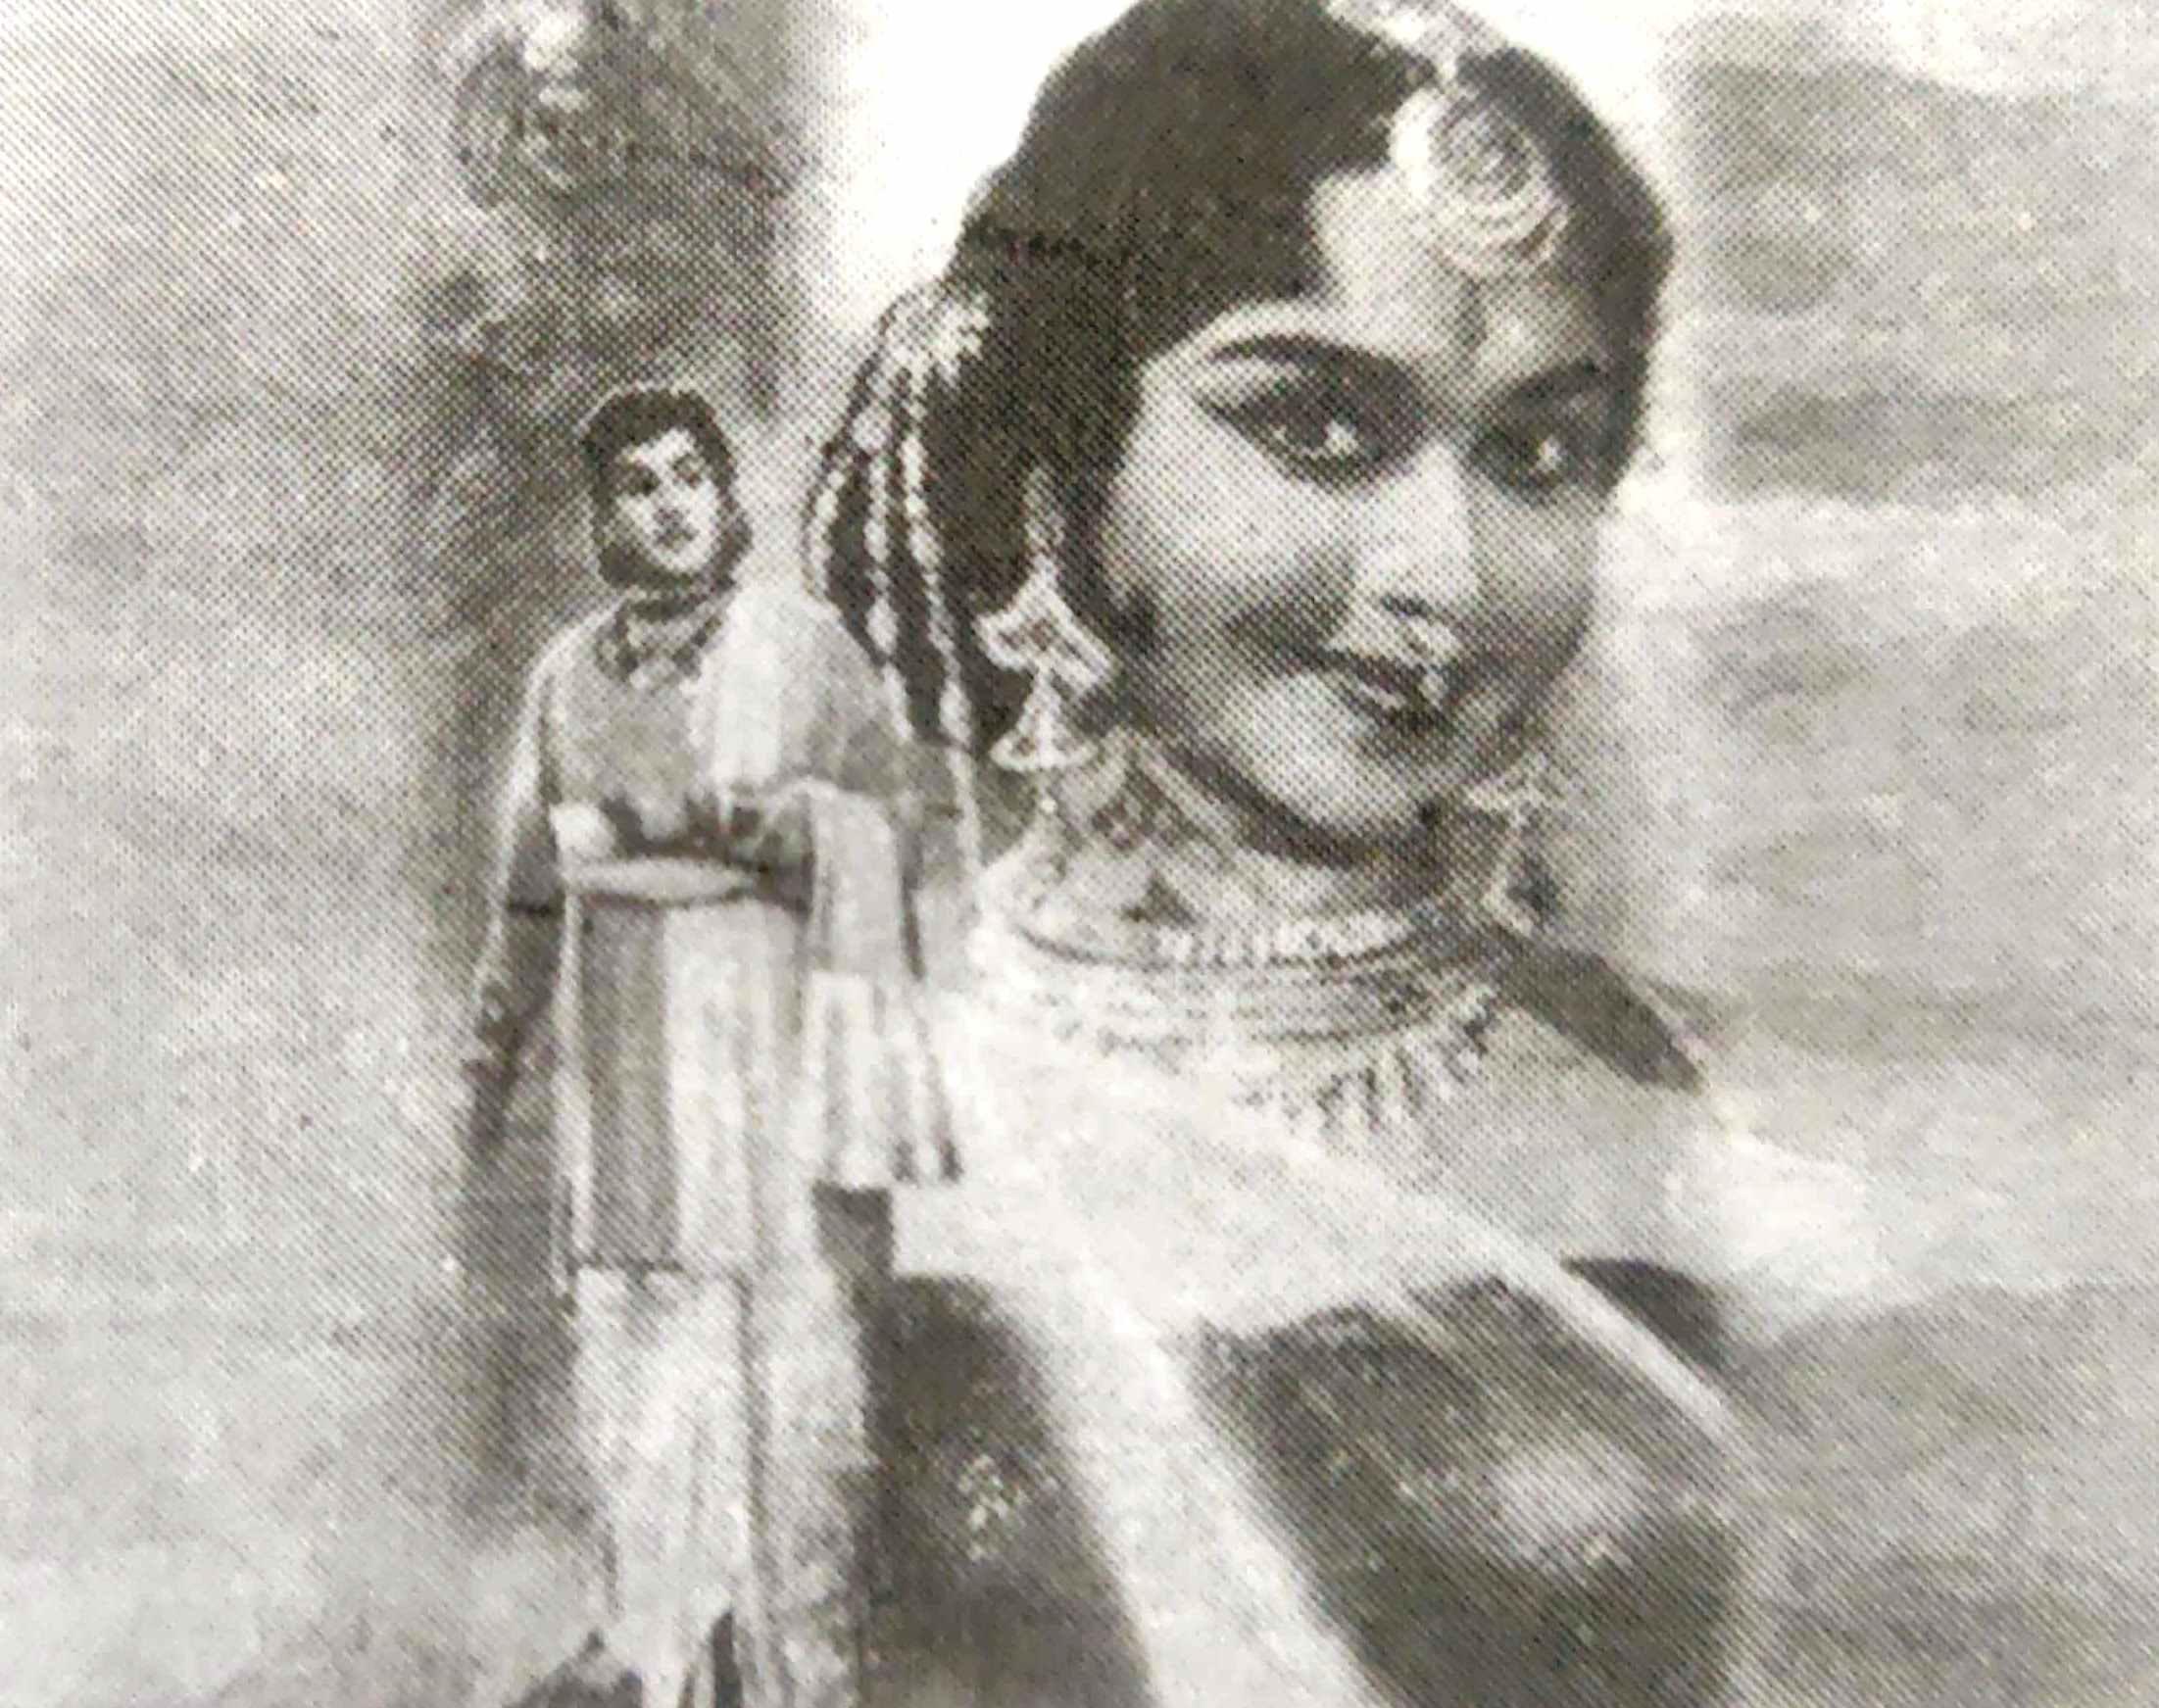 Amara Silpi Jakkanna (1964): Tollywood's First Eastmancolor Production #TeluguCinemaHistory